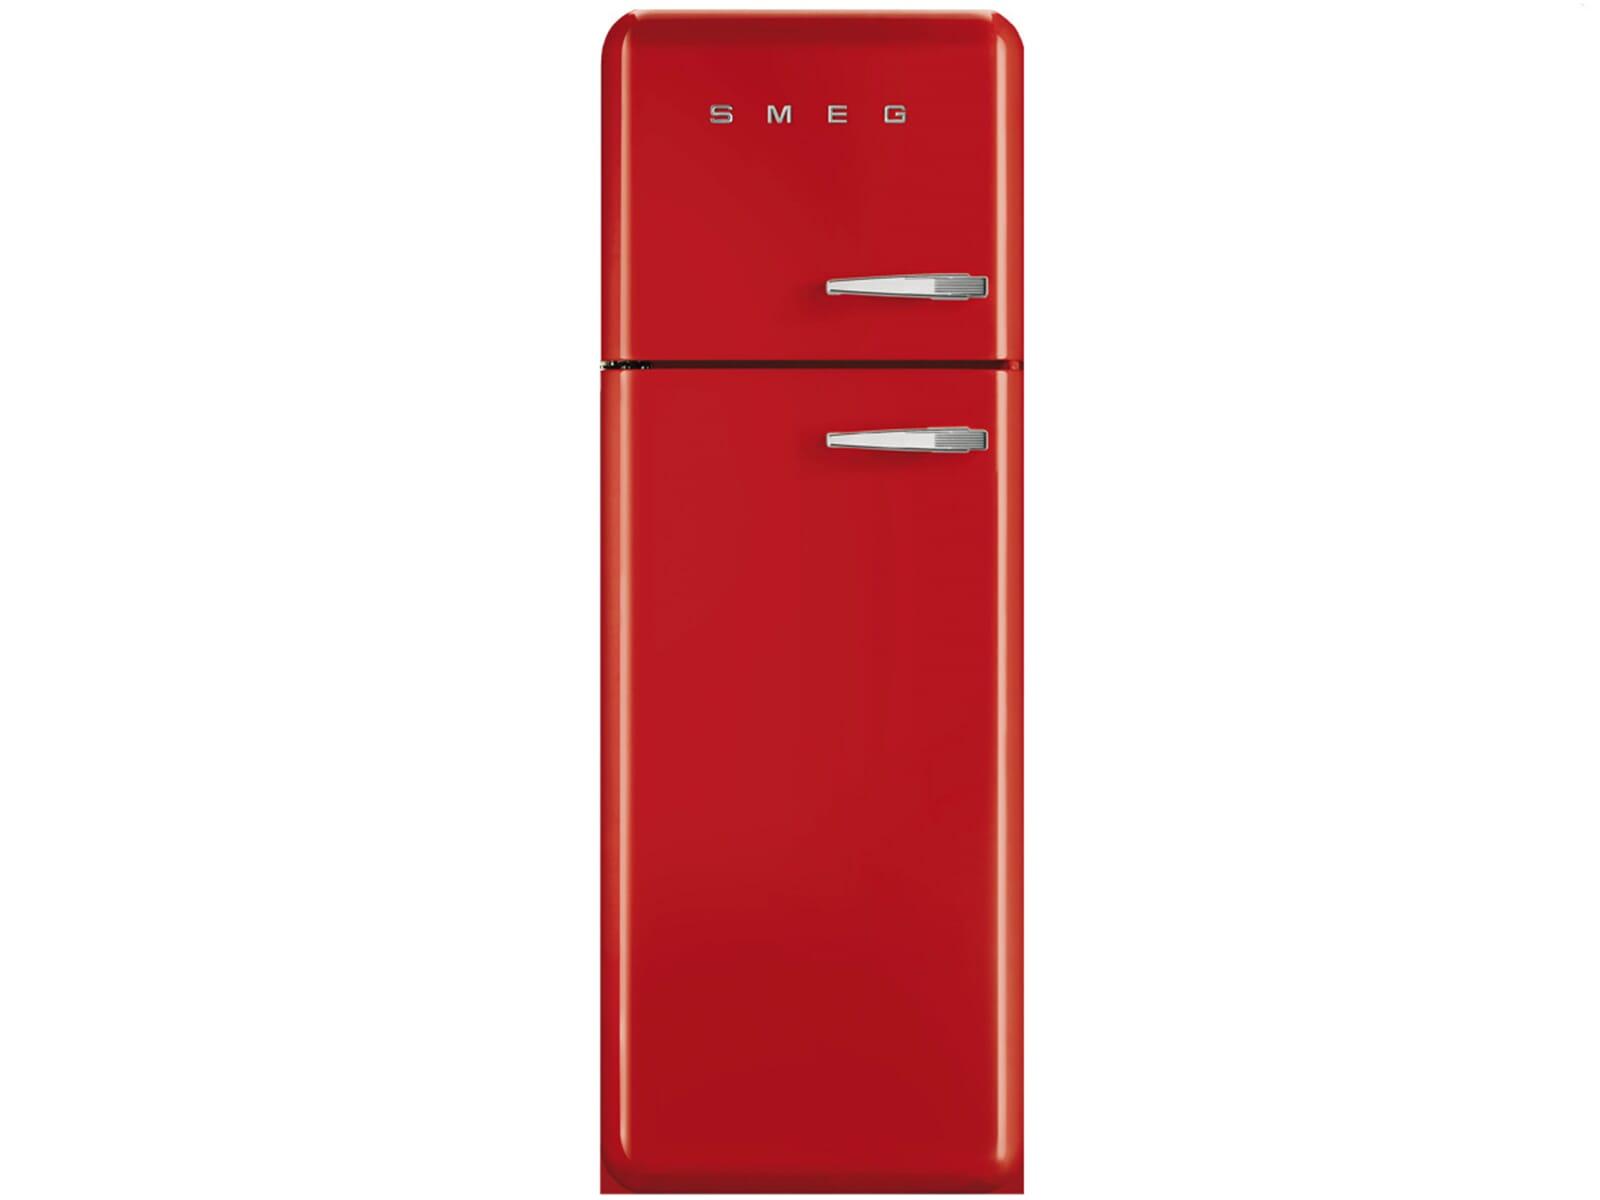 Smeg Kühlschrank Gefrierkombination : Kühl gefrierkombi rot smeg fab32rrd3 kühl gefrierkombination rot